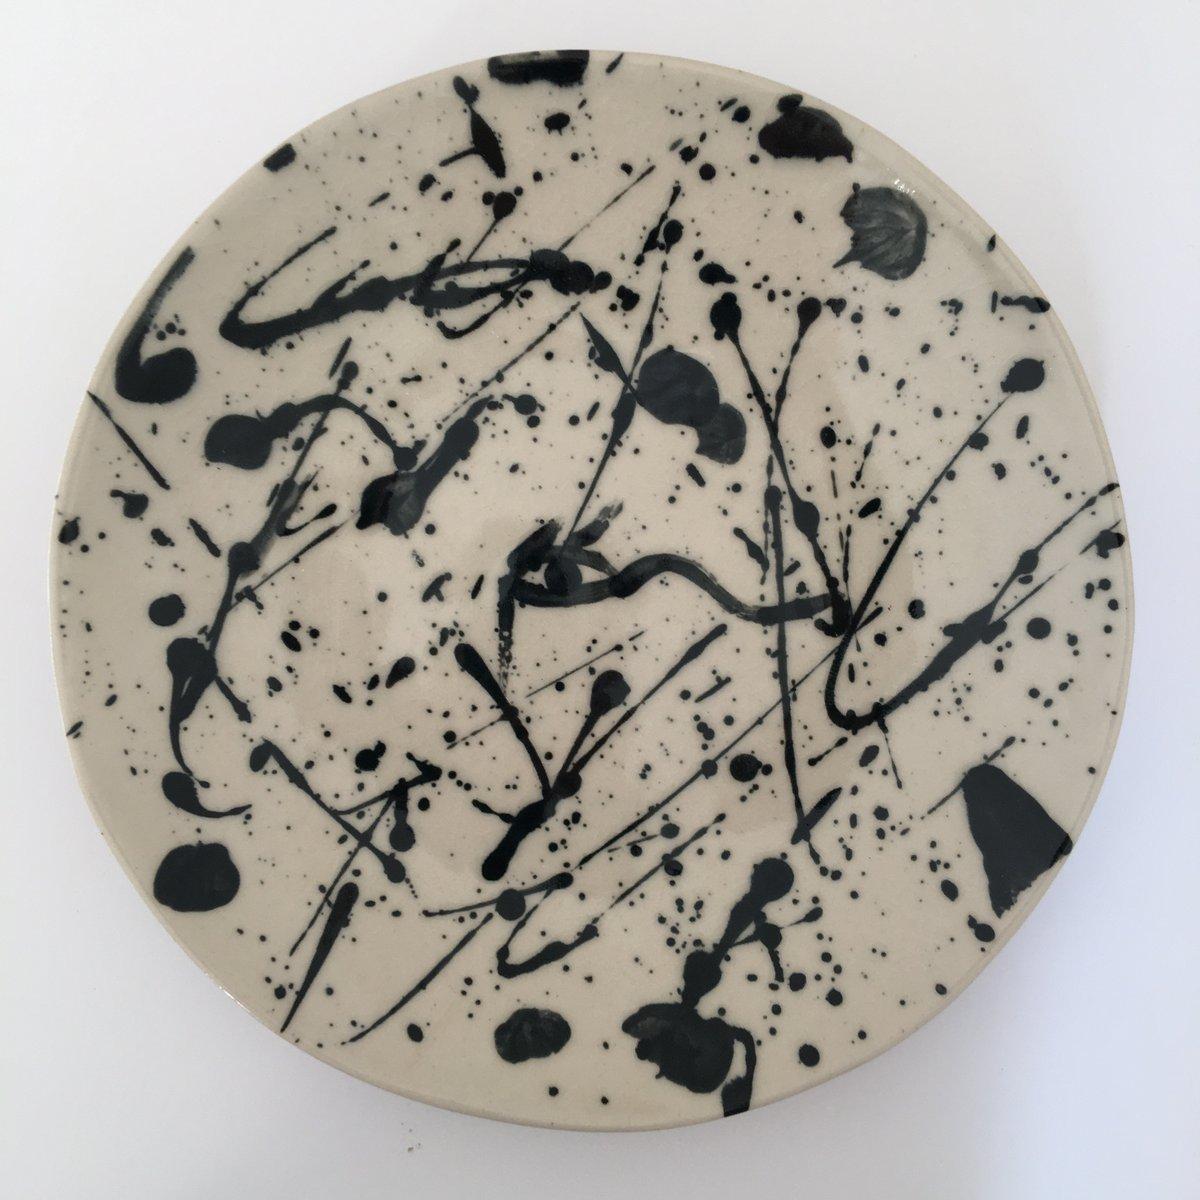 Splatter Plate with Eye